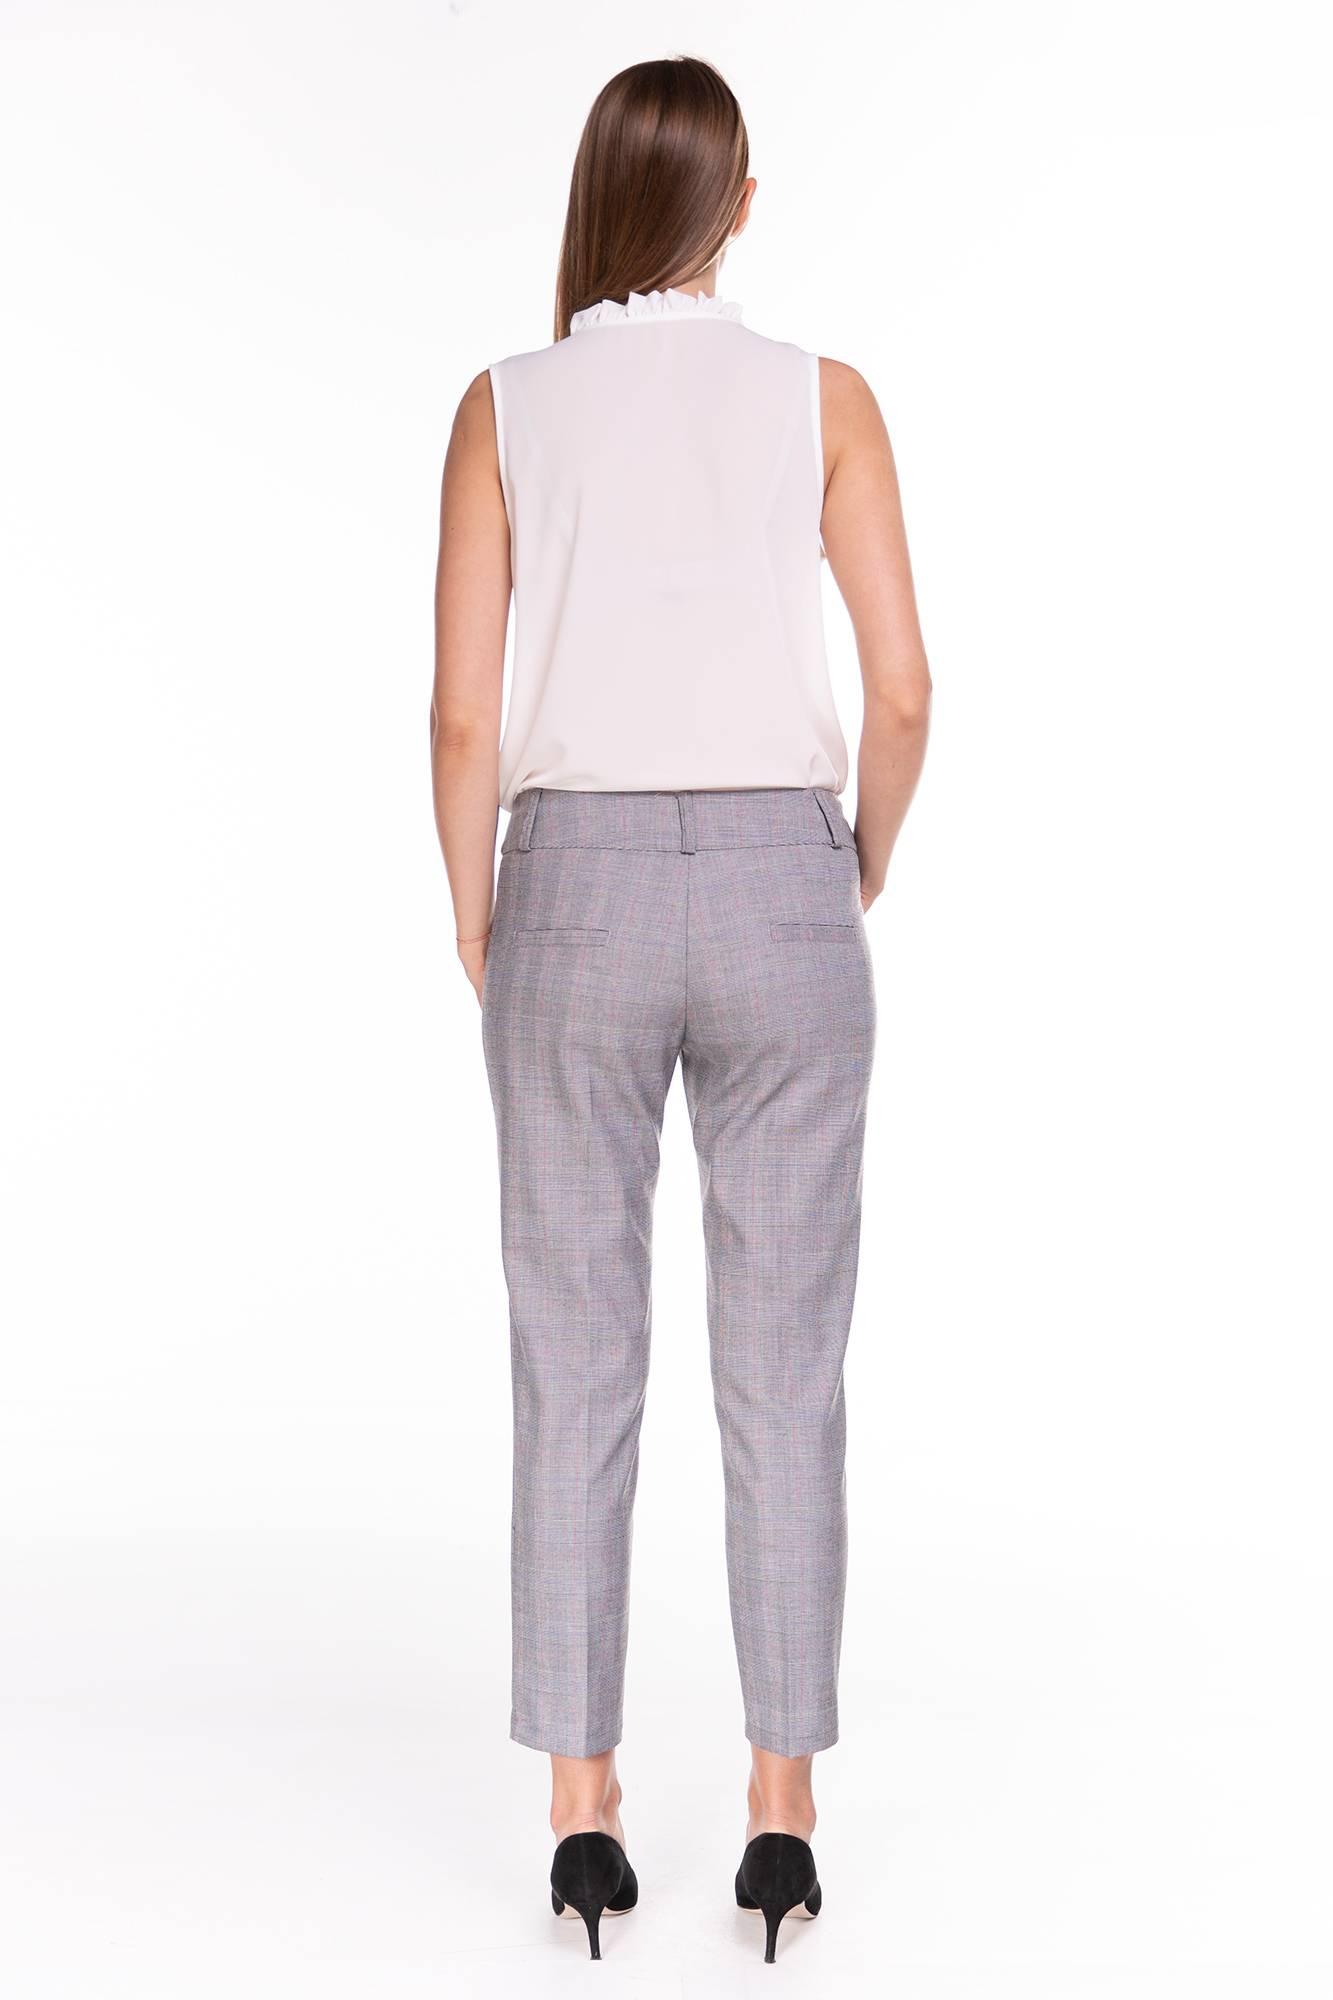 Spodnie Capri Kratka